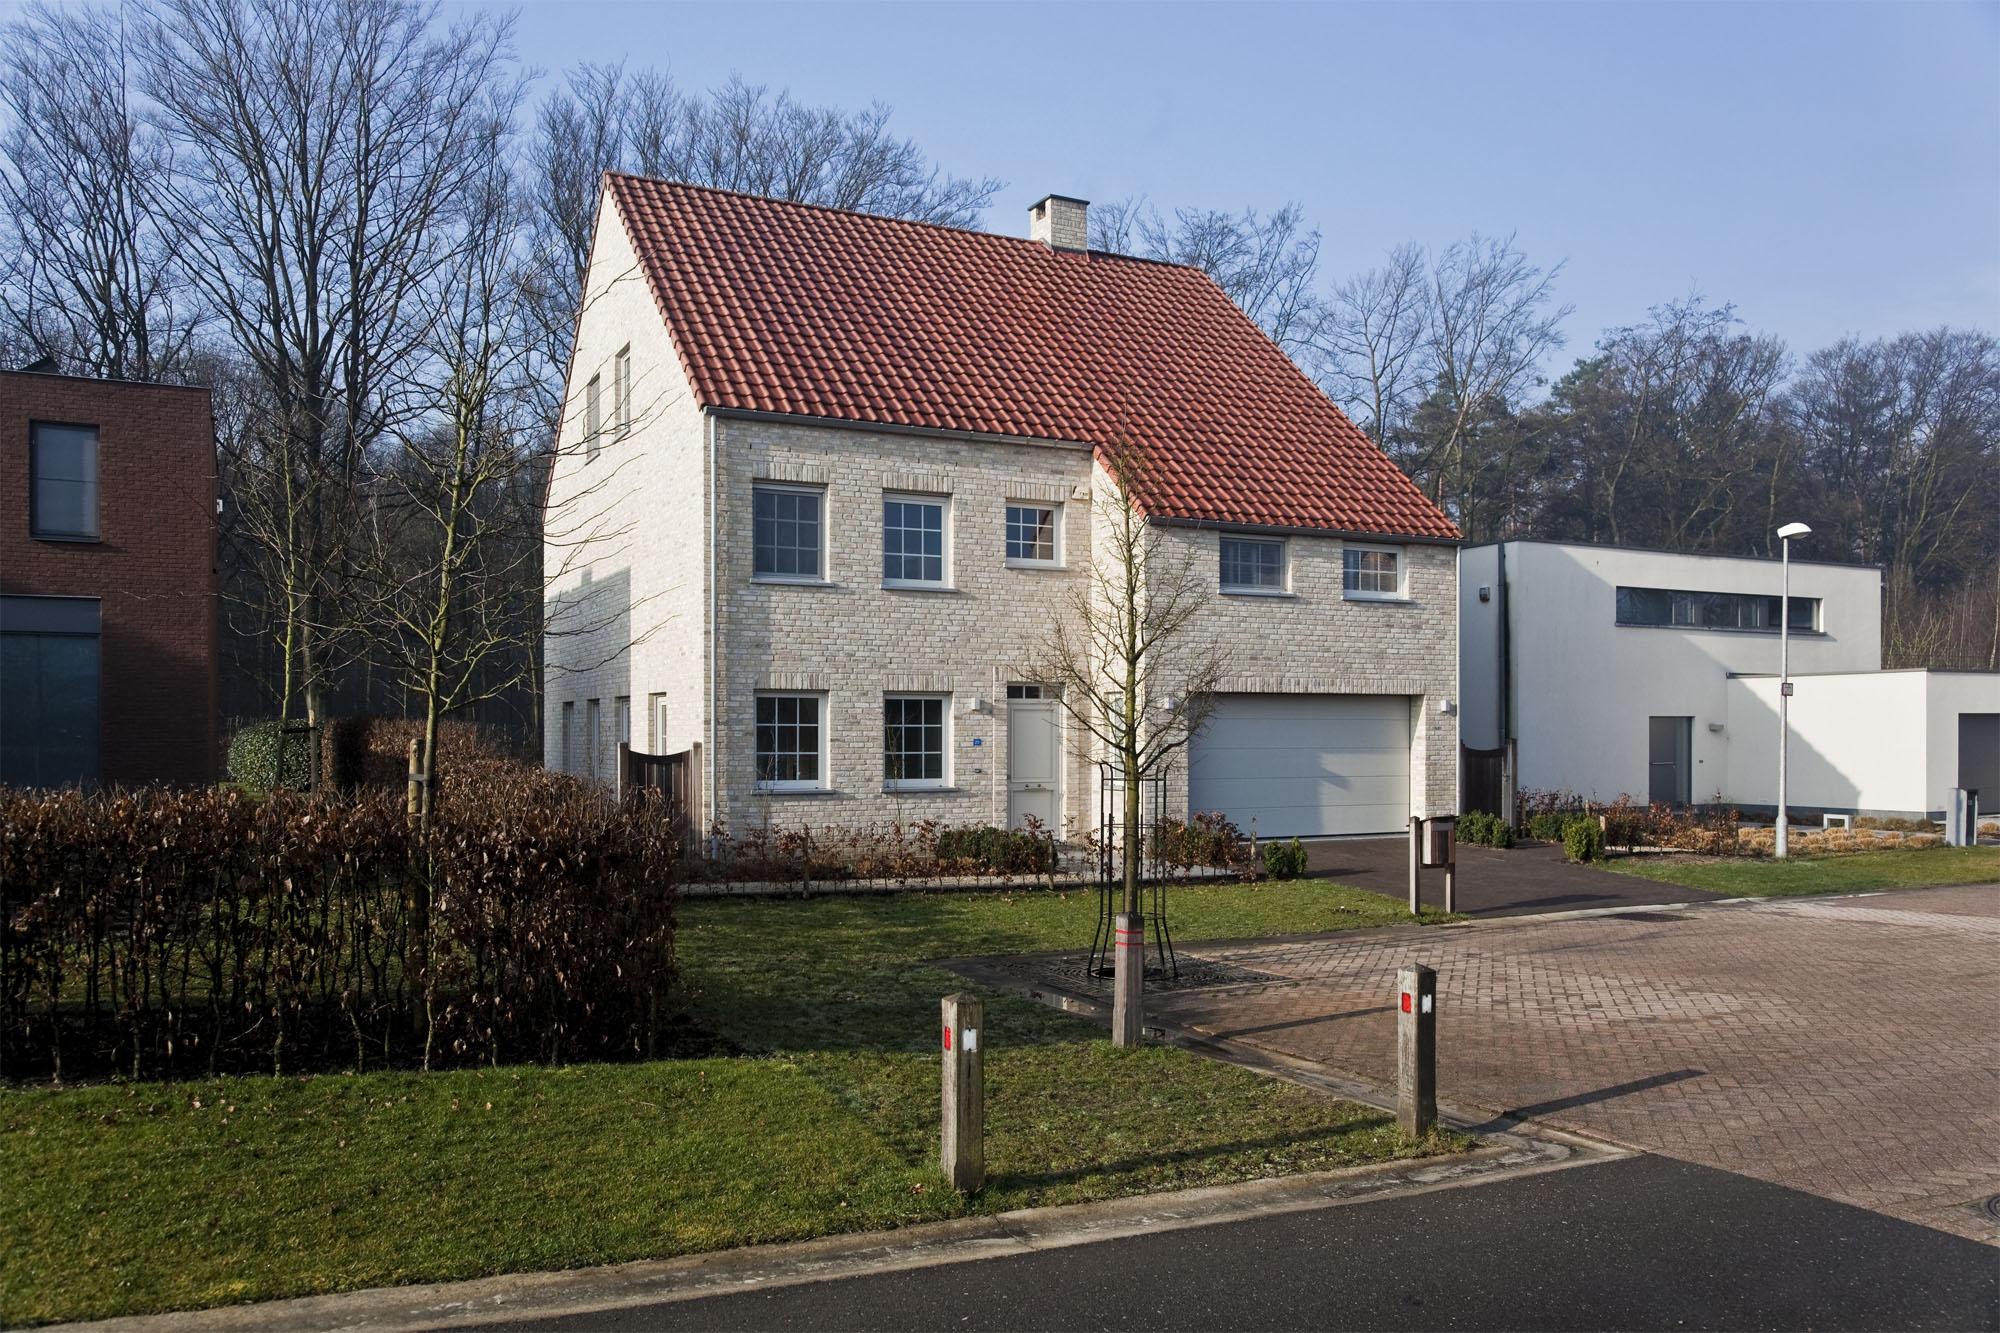 Hedendaagse landelijke woning - Ketswoningbouw